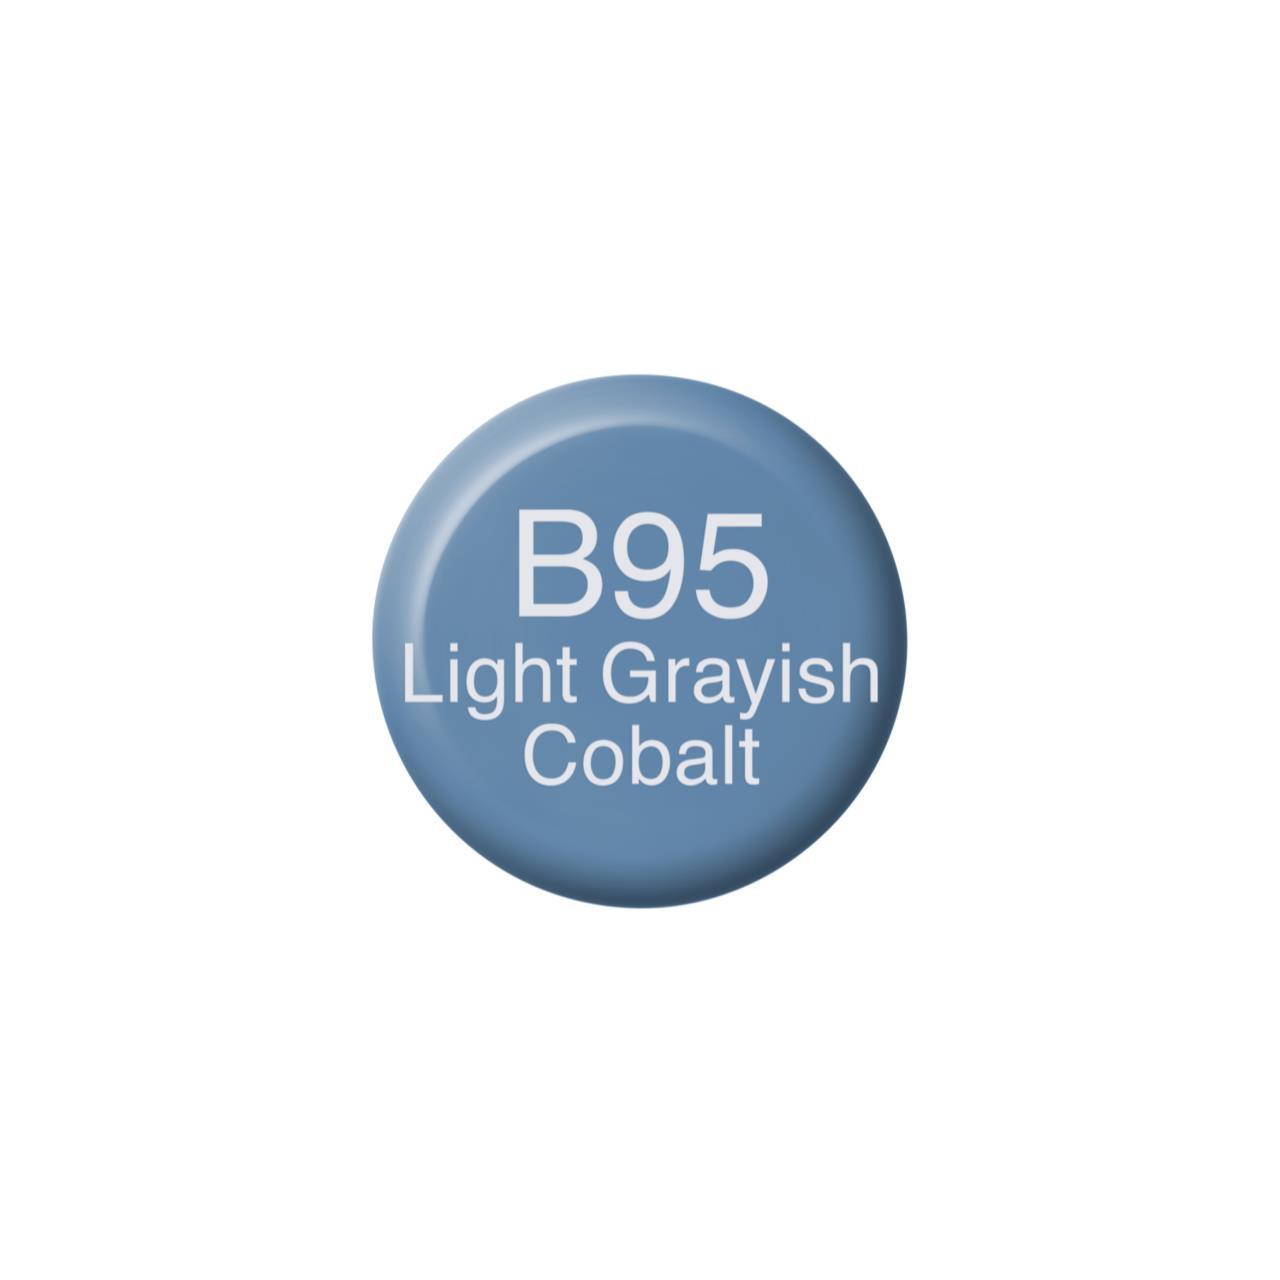 B95 Light Grayish Cobalt, Copic Ink - 4511338056127